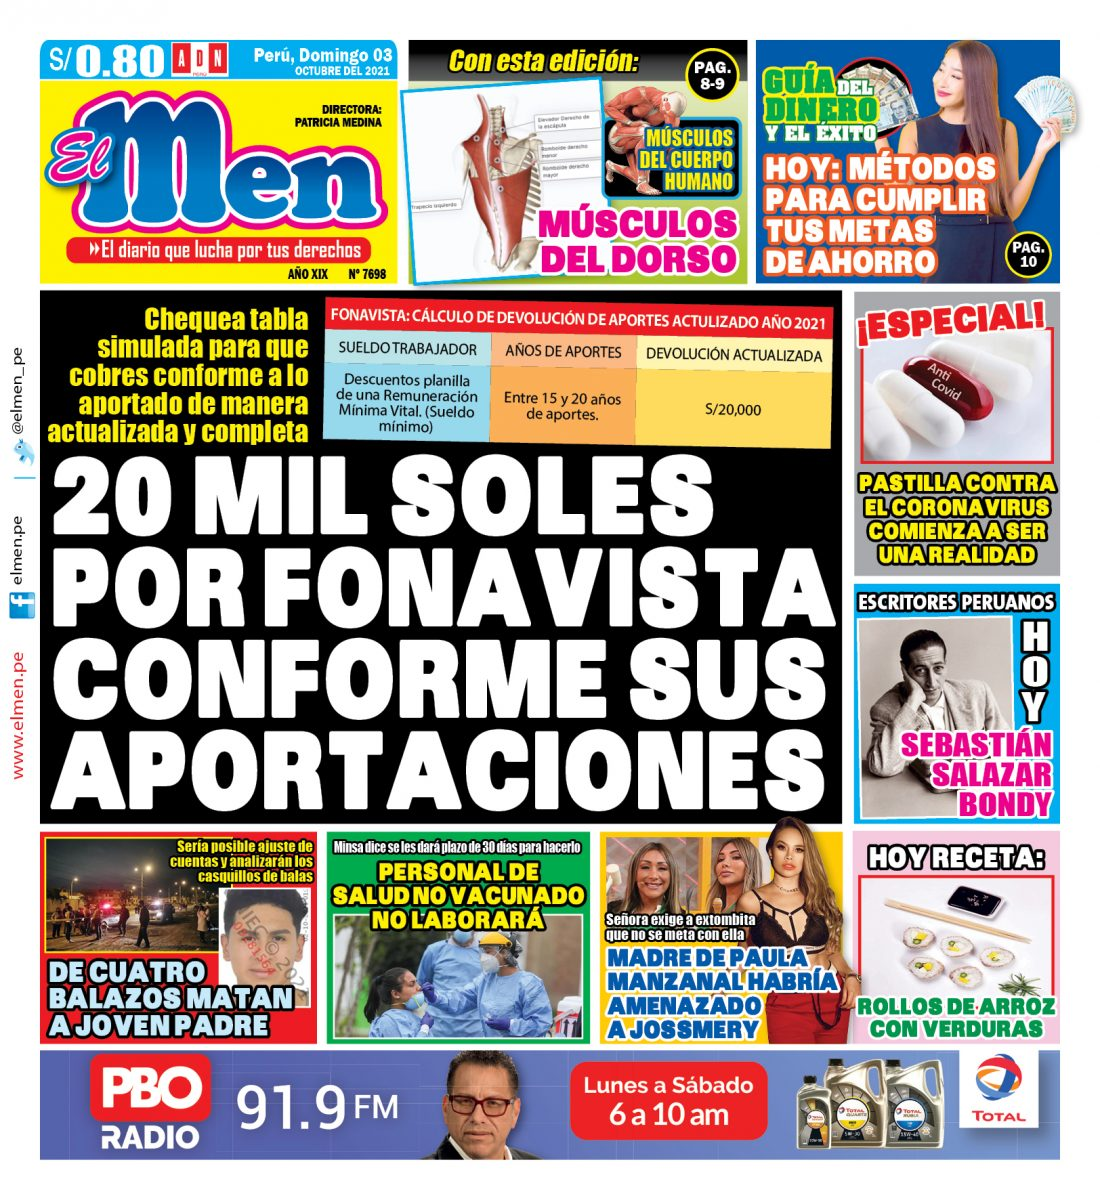 Portada impresa – Diario El Men (03/10/2021)